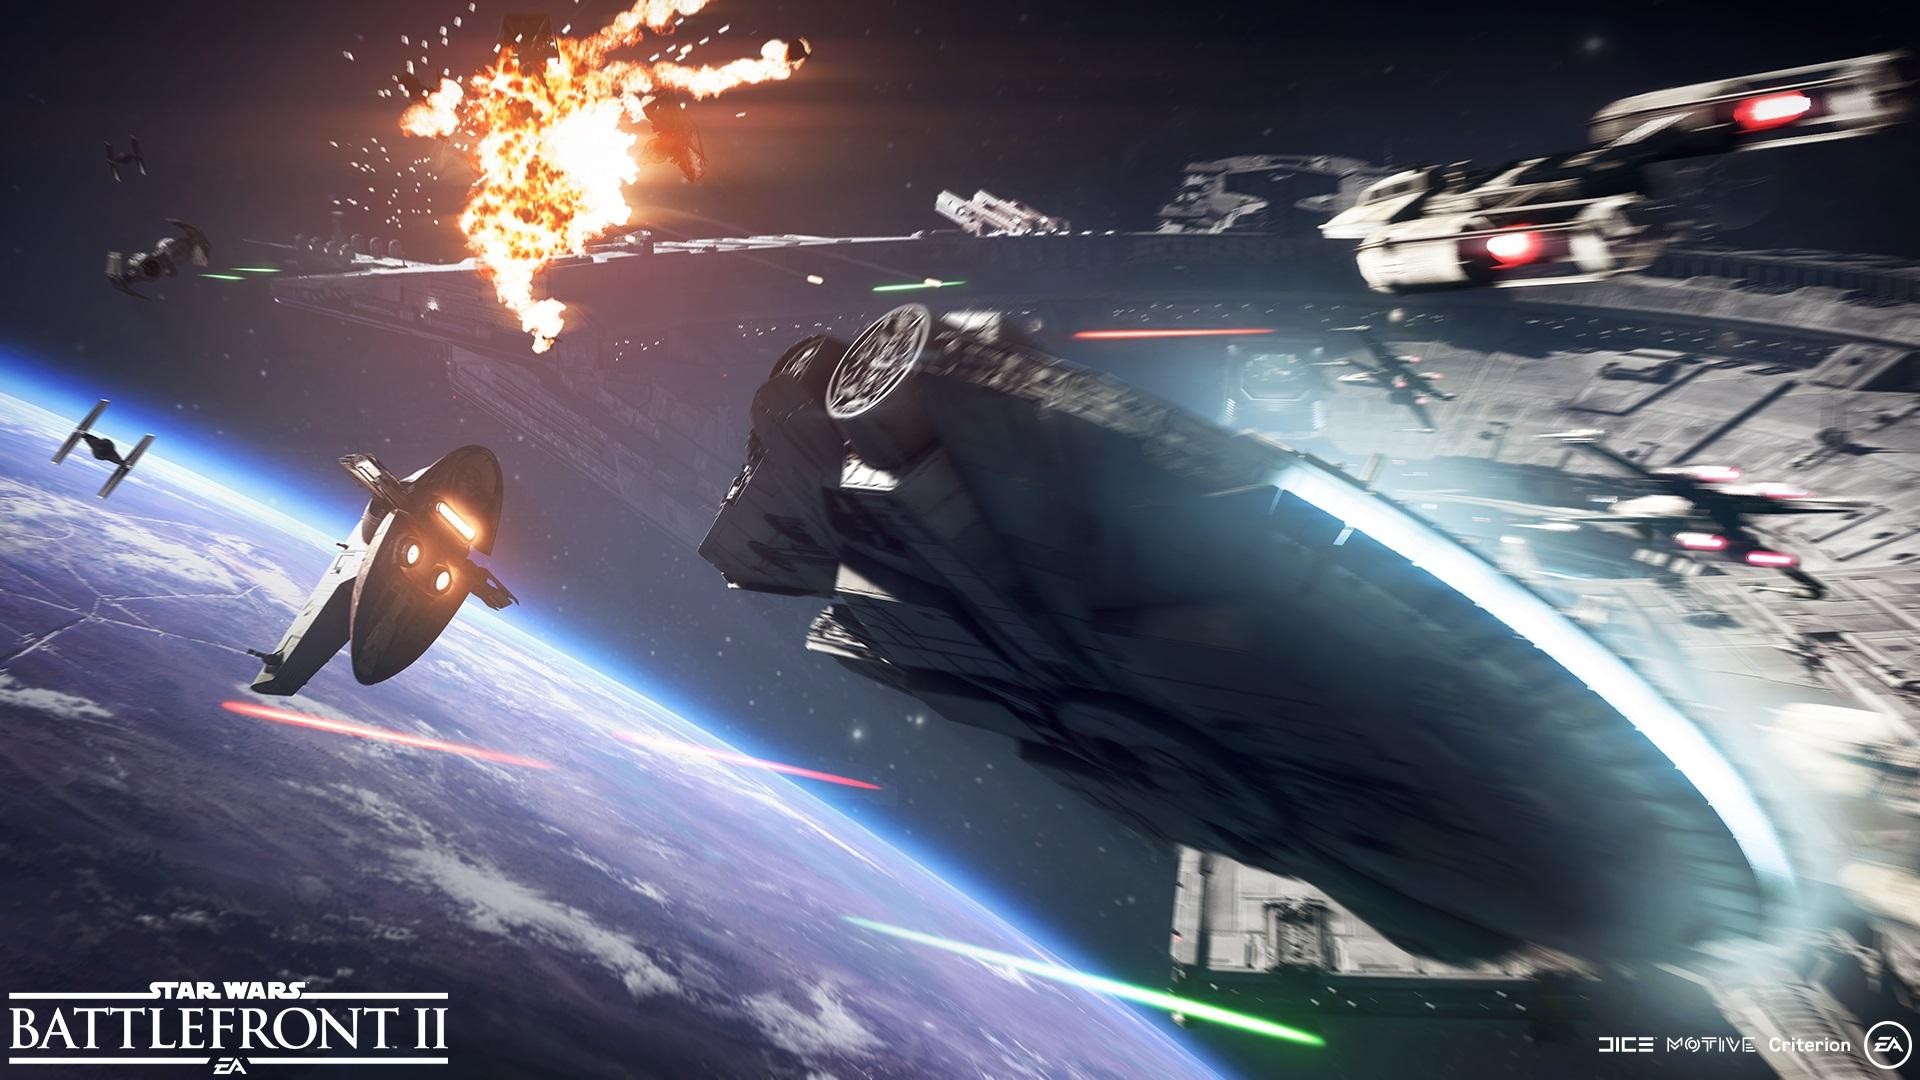 Star Wars Wallpaper Hd Y Wing Keysinspectorinc.com